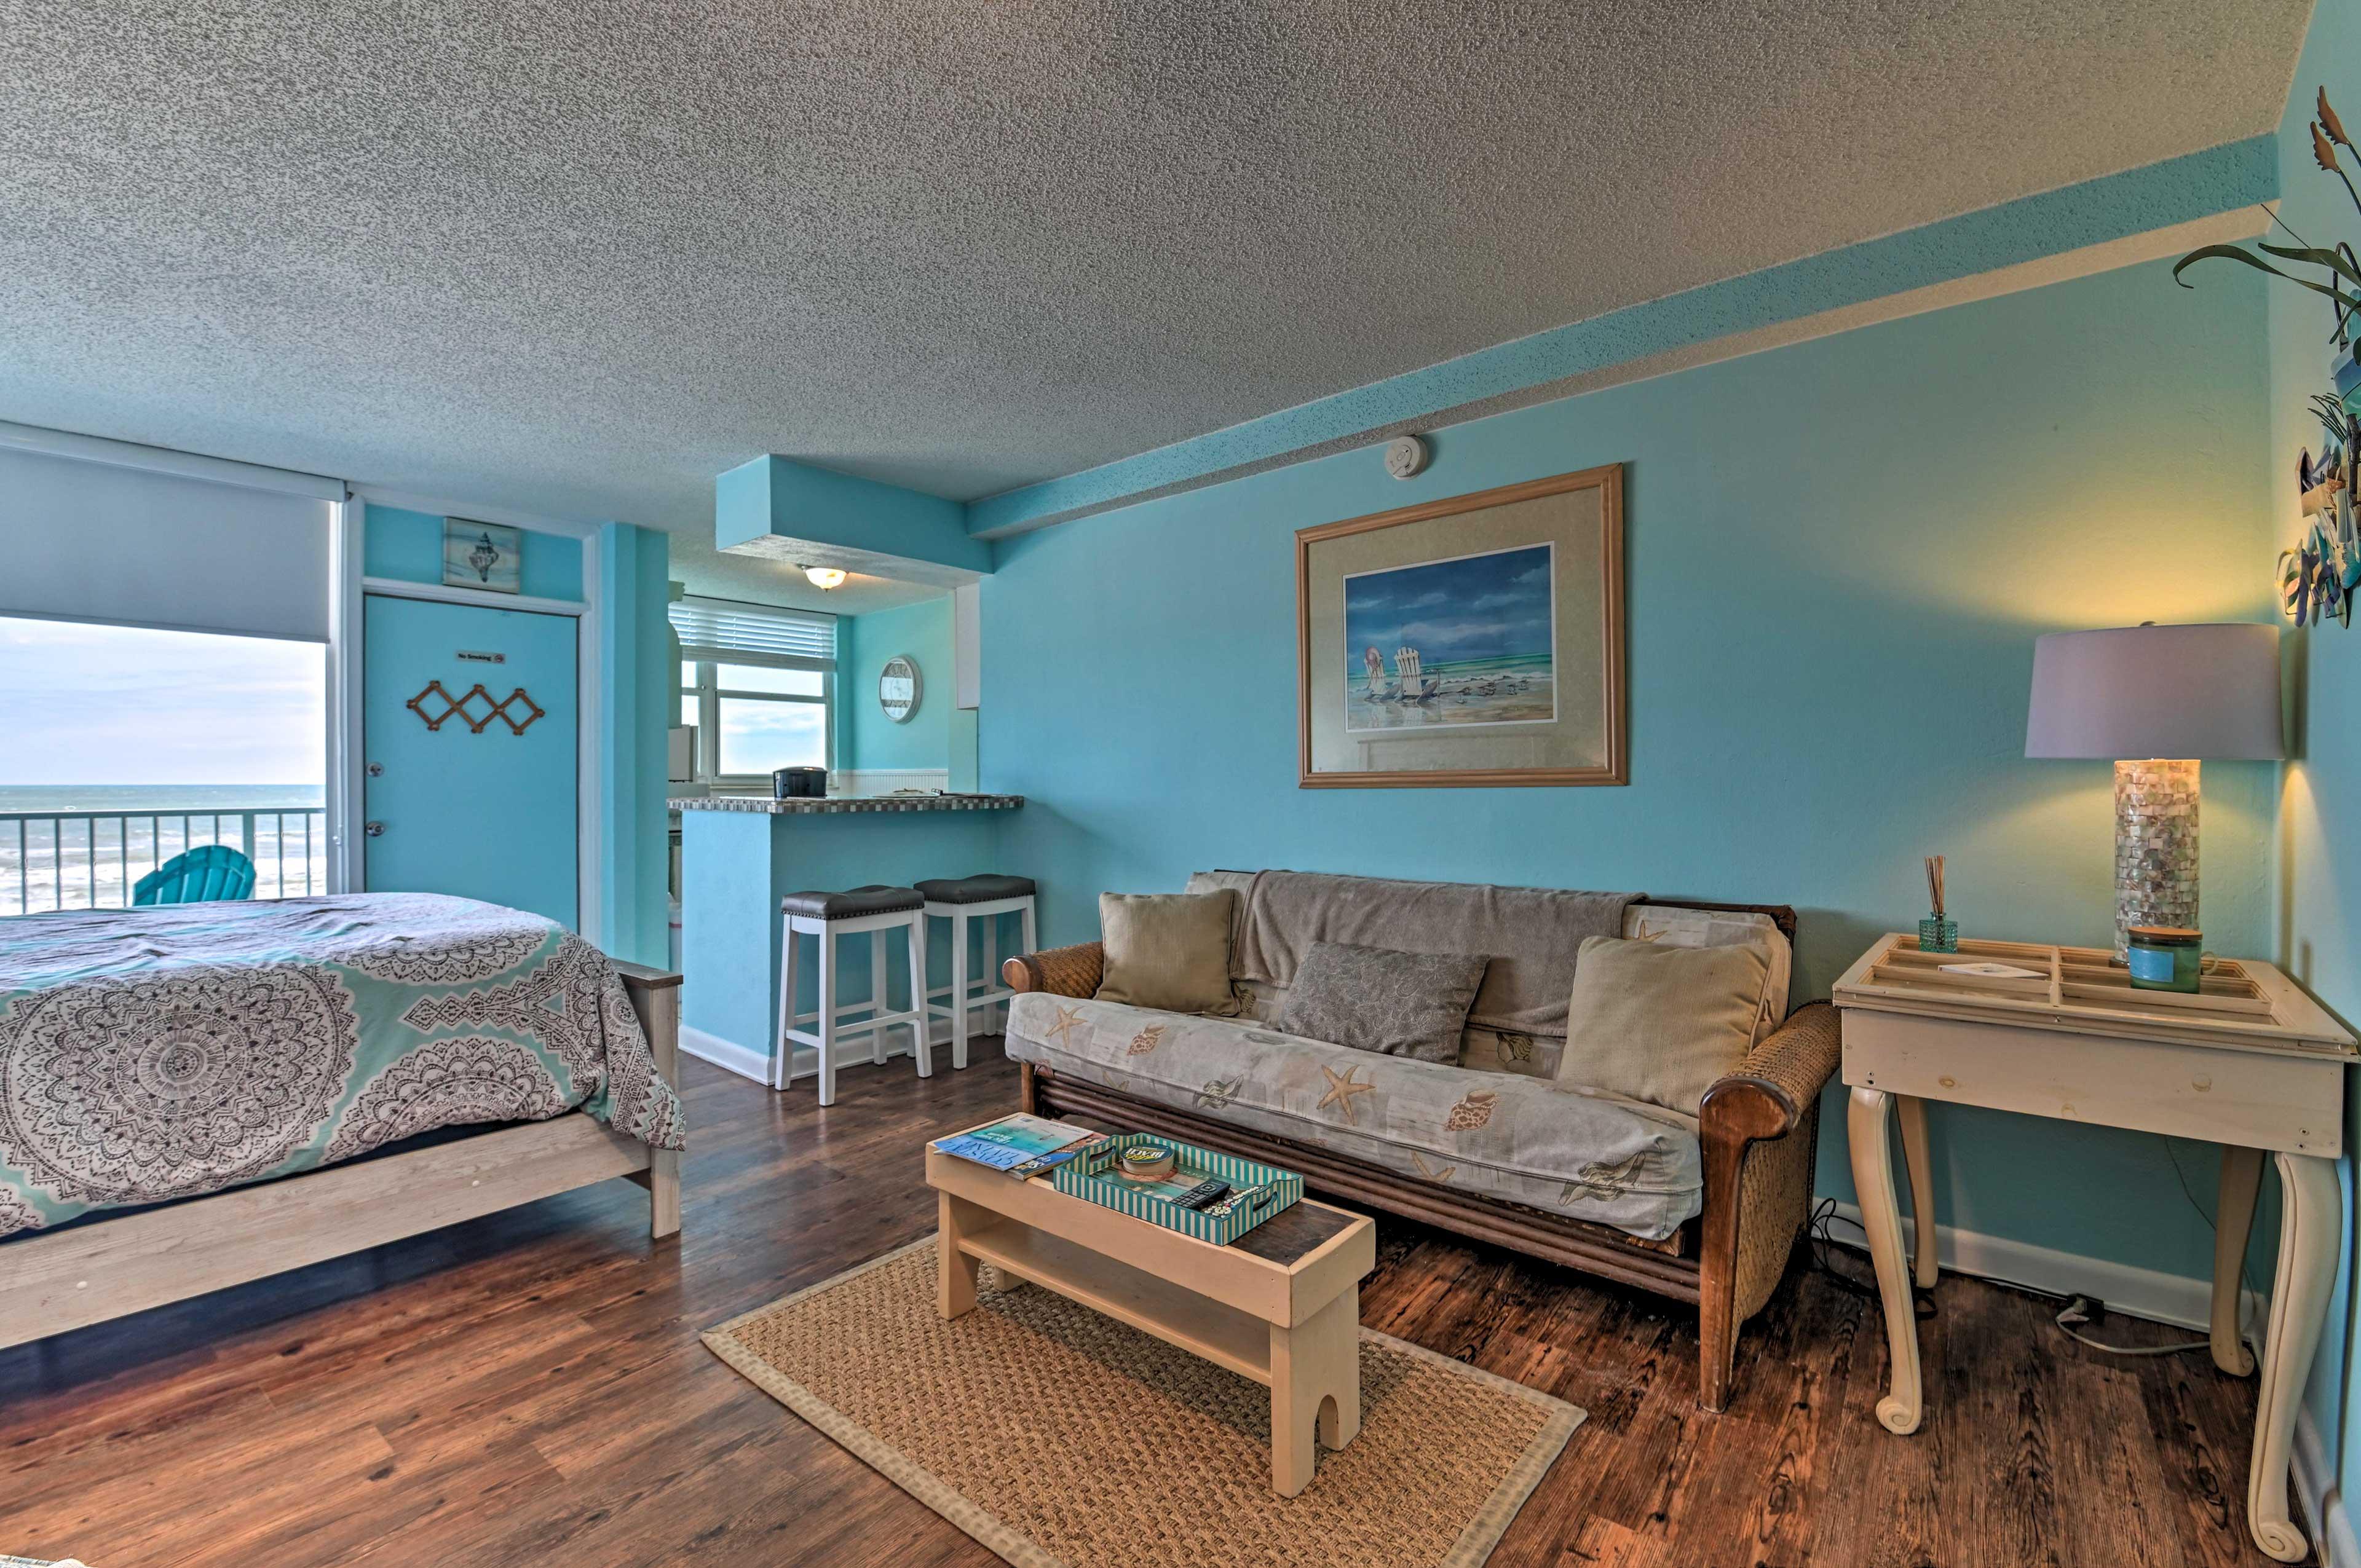 Nautical decor brings the seaside inspirations inside.